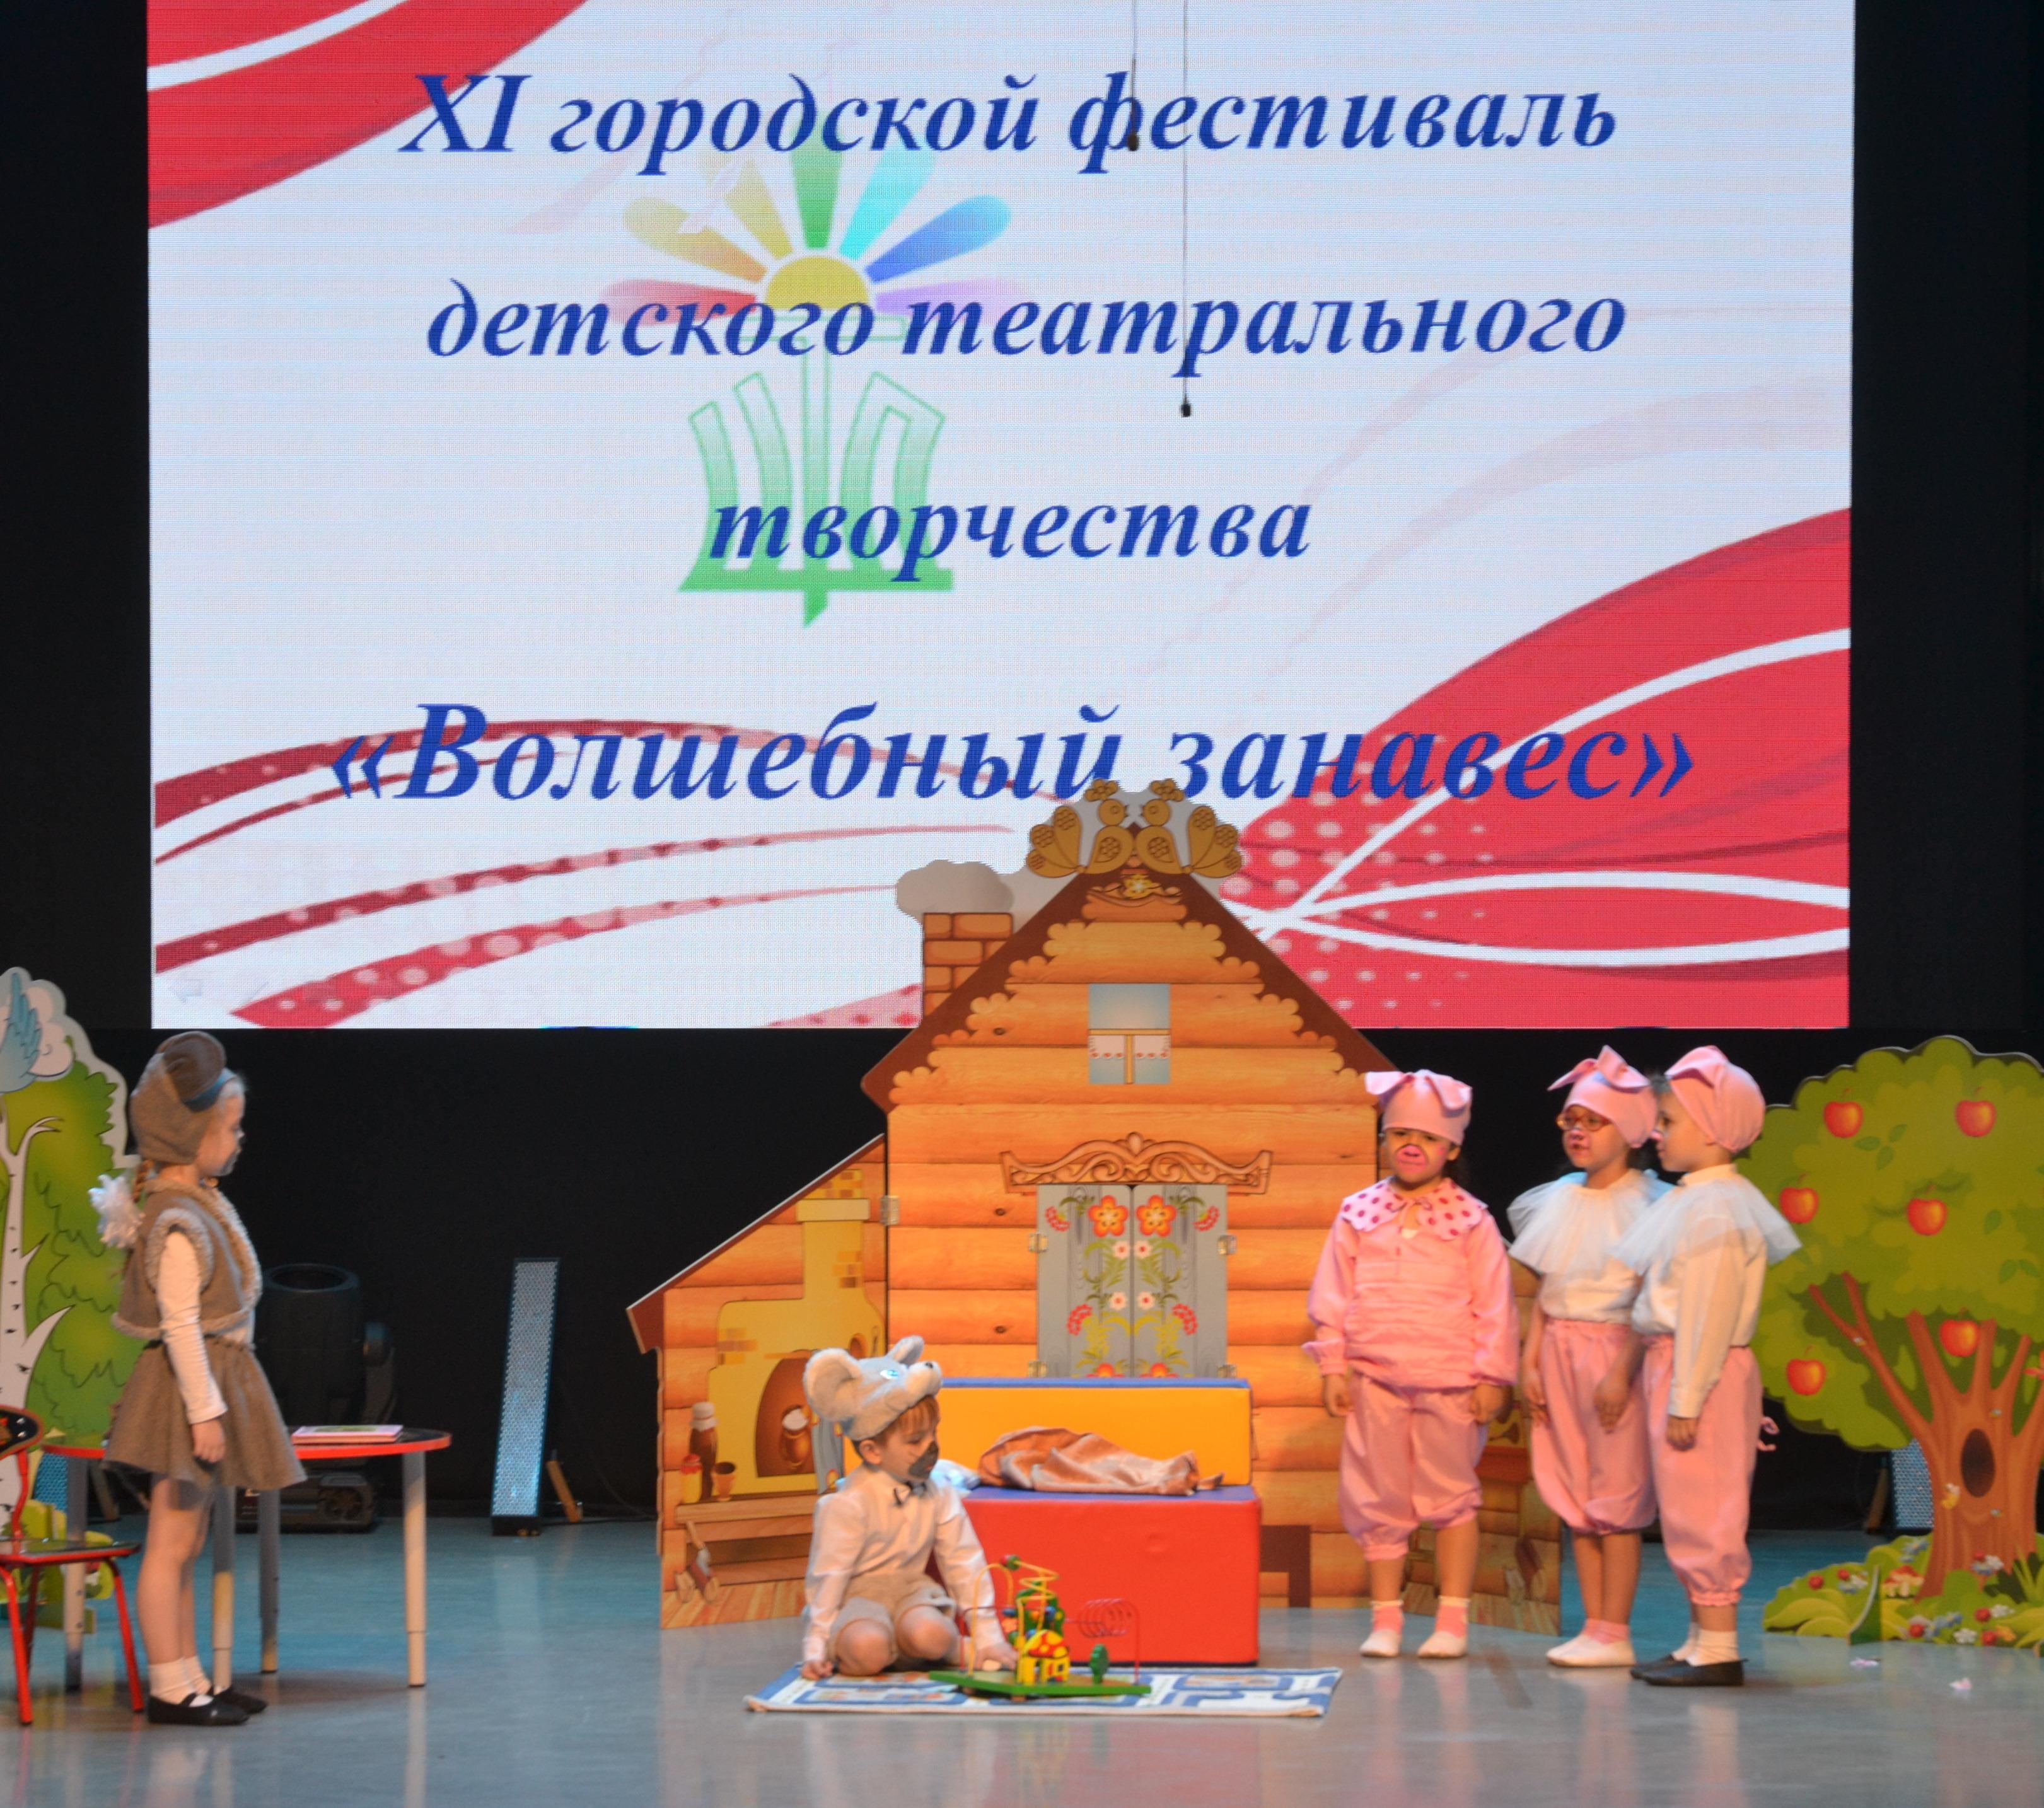 Коллектив Калинка